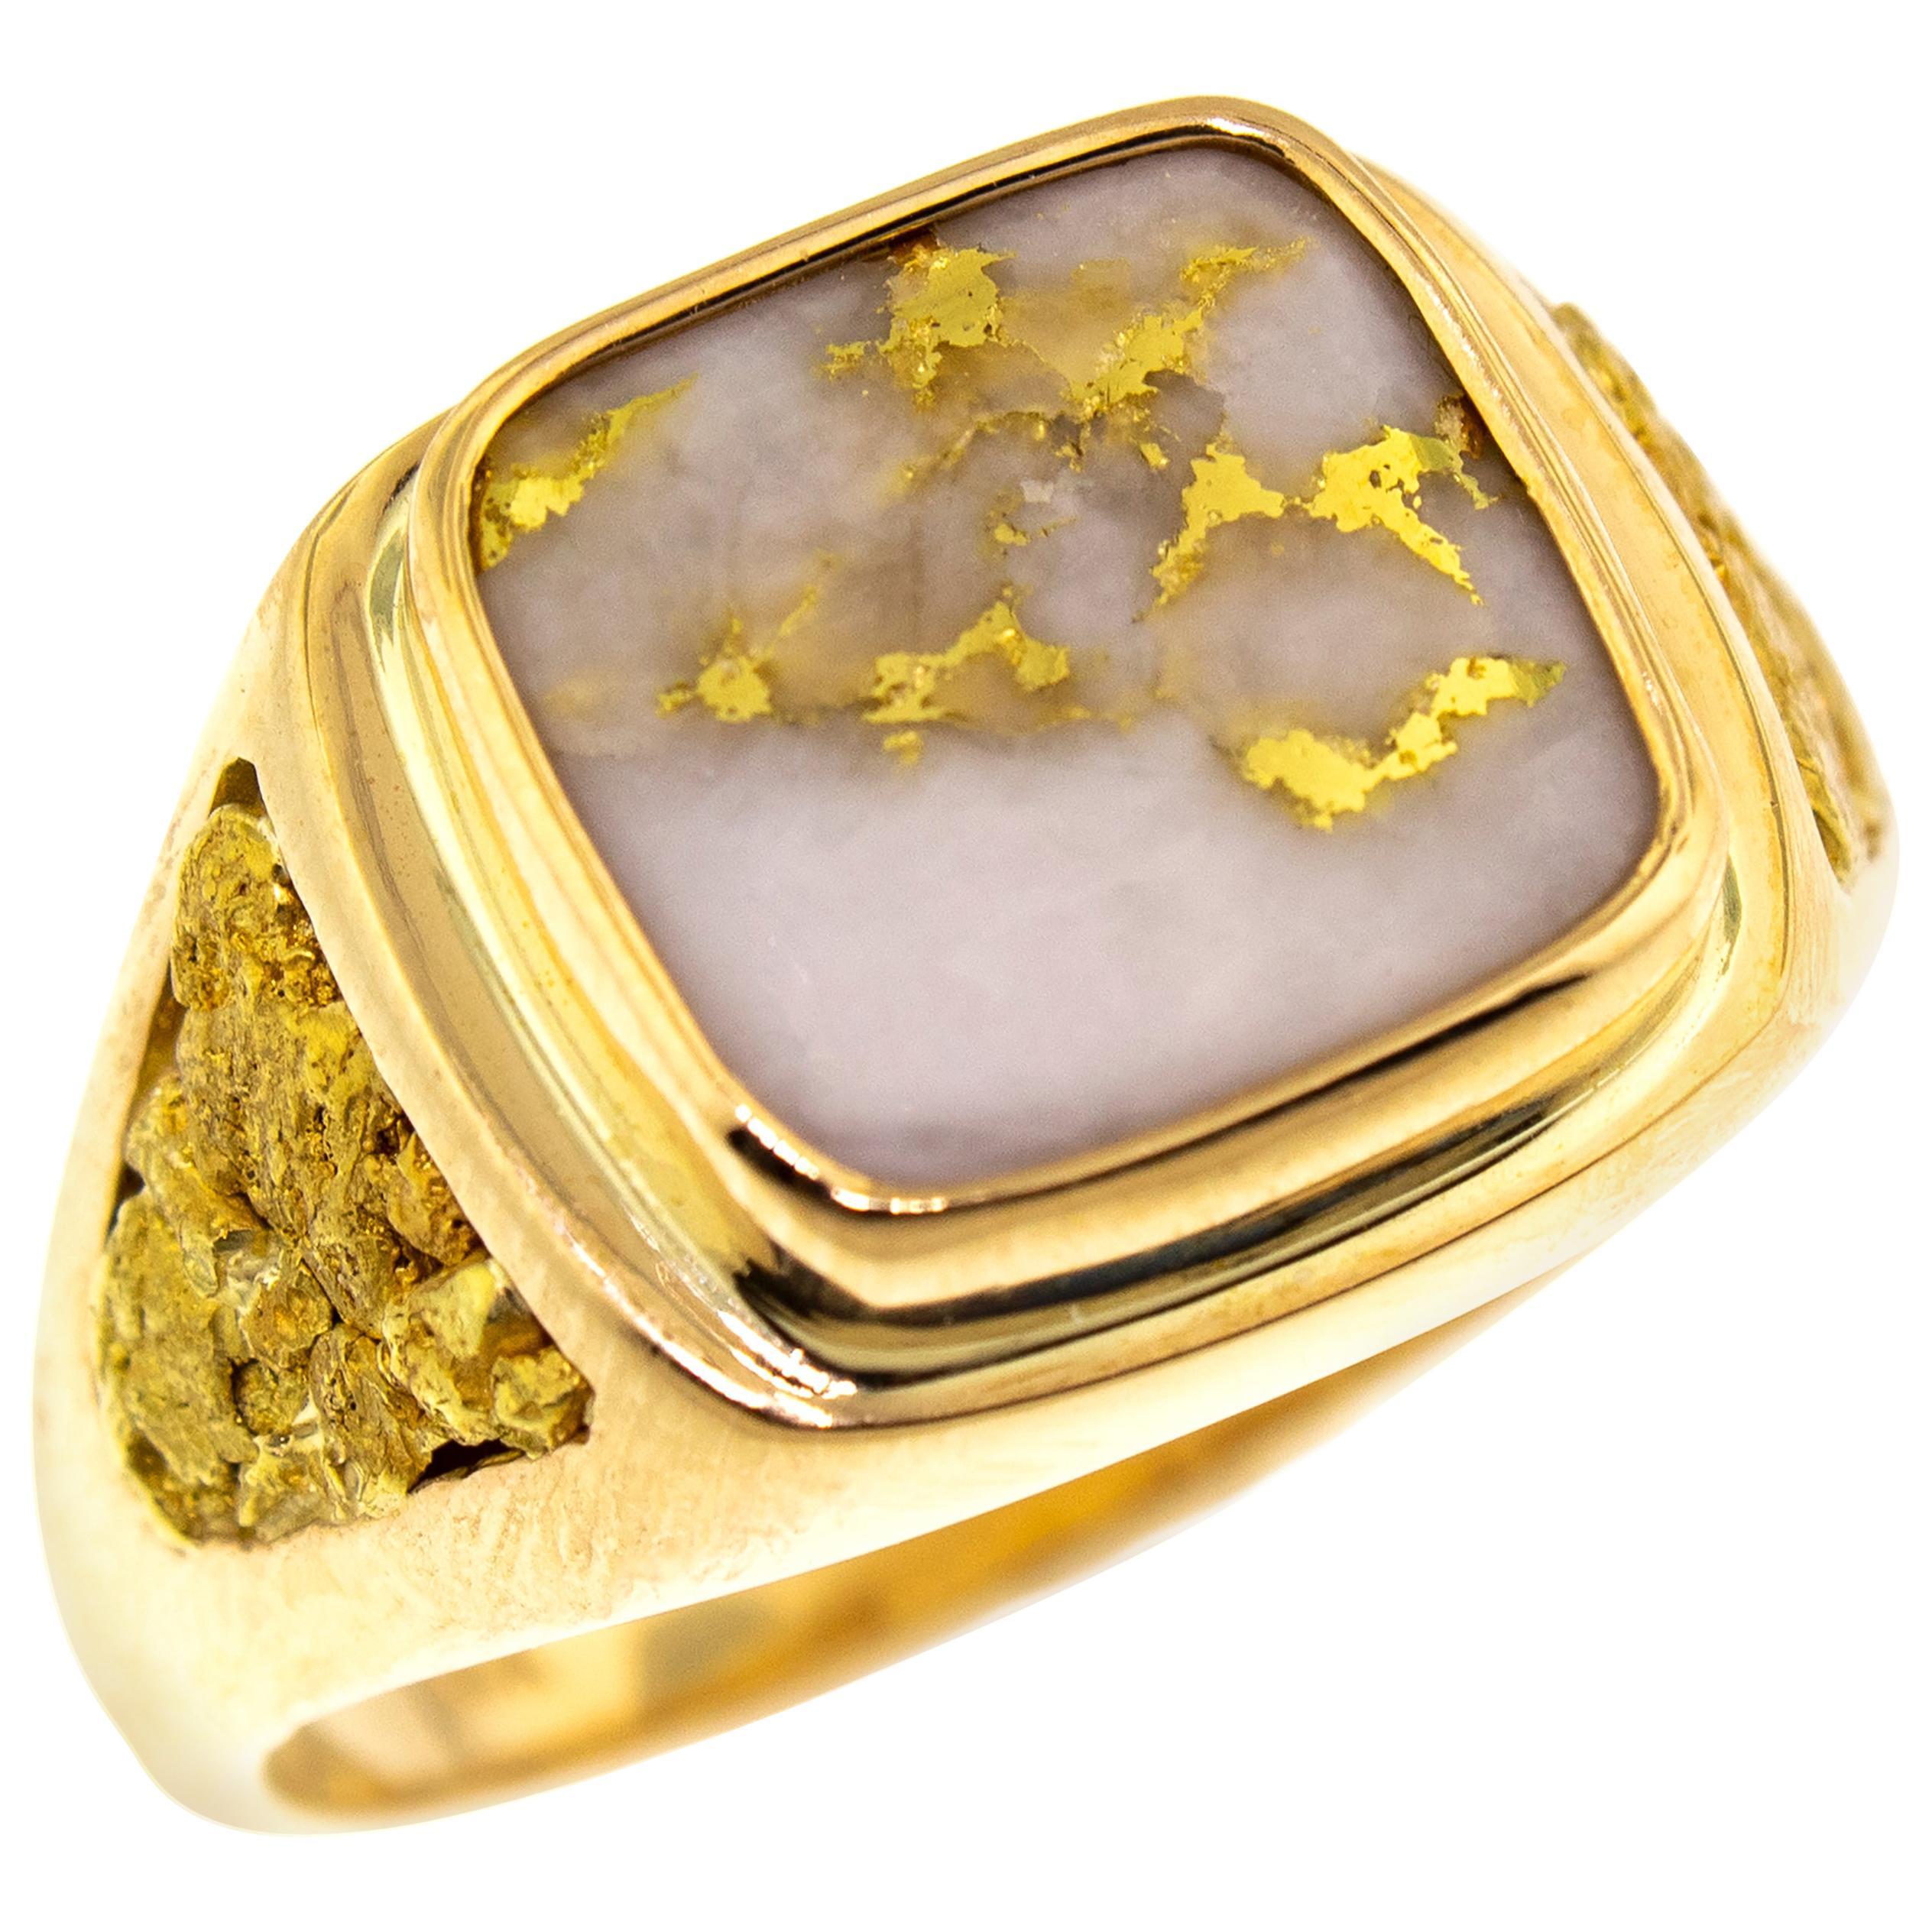 Natural Gold Bearing Quartz and Gold Nugget 14 Karat Gold Men's Ring